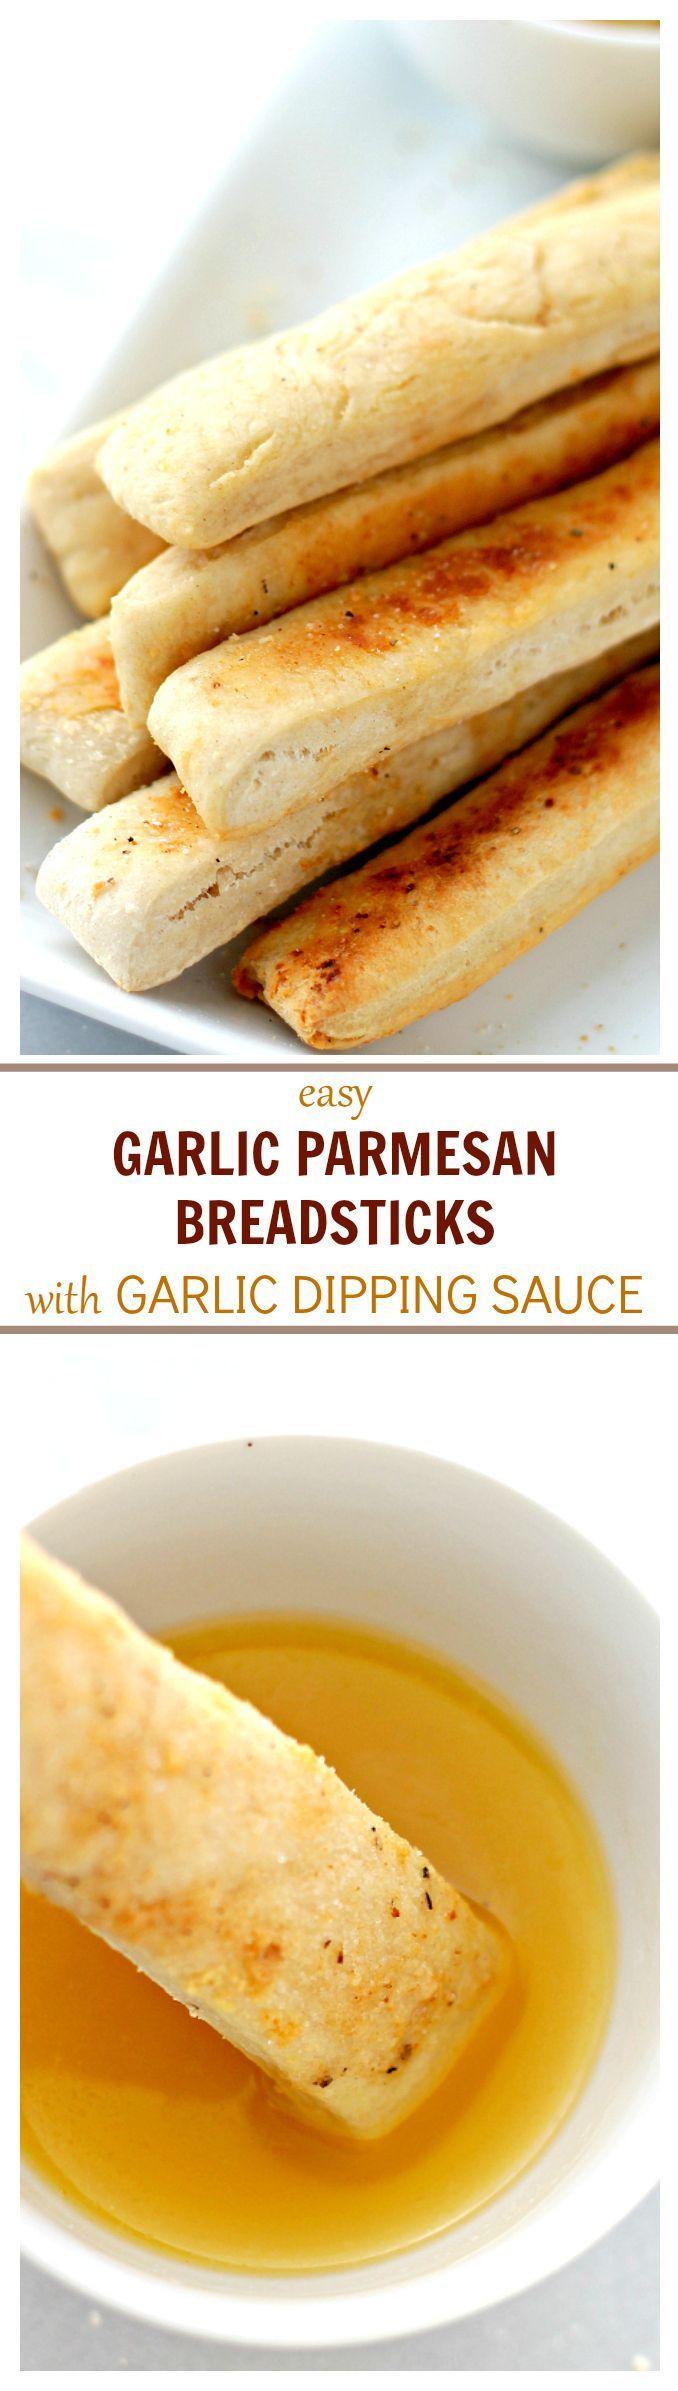 Easy Garlic Parmesan Breadsticks with Garlic Dipping Sauce | www ...